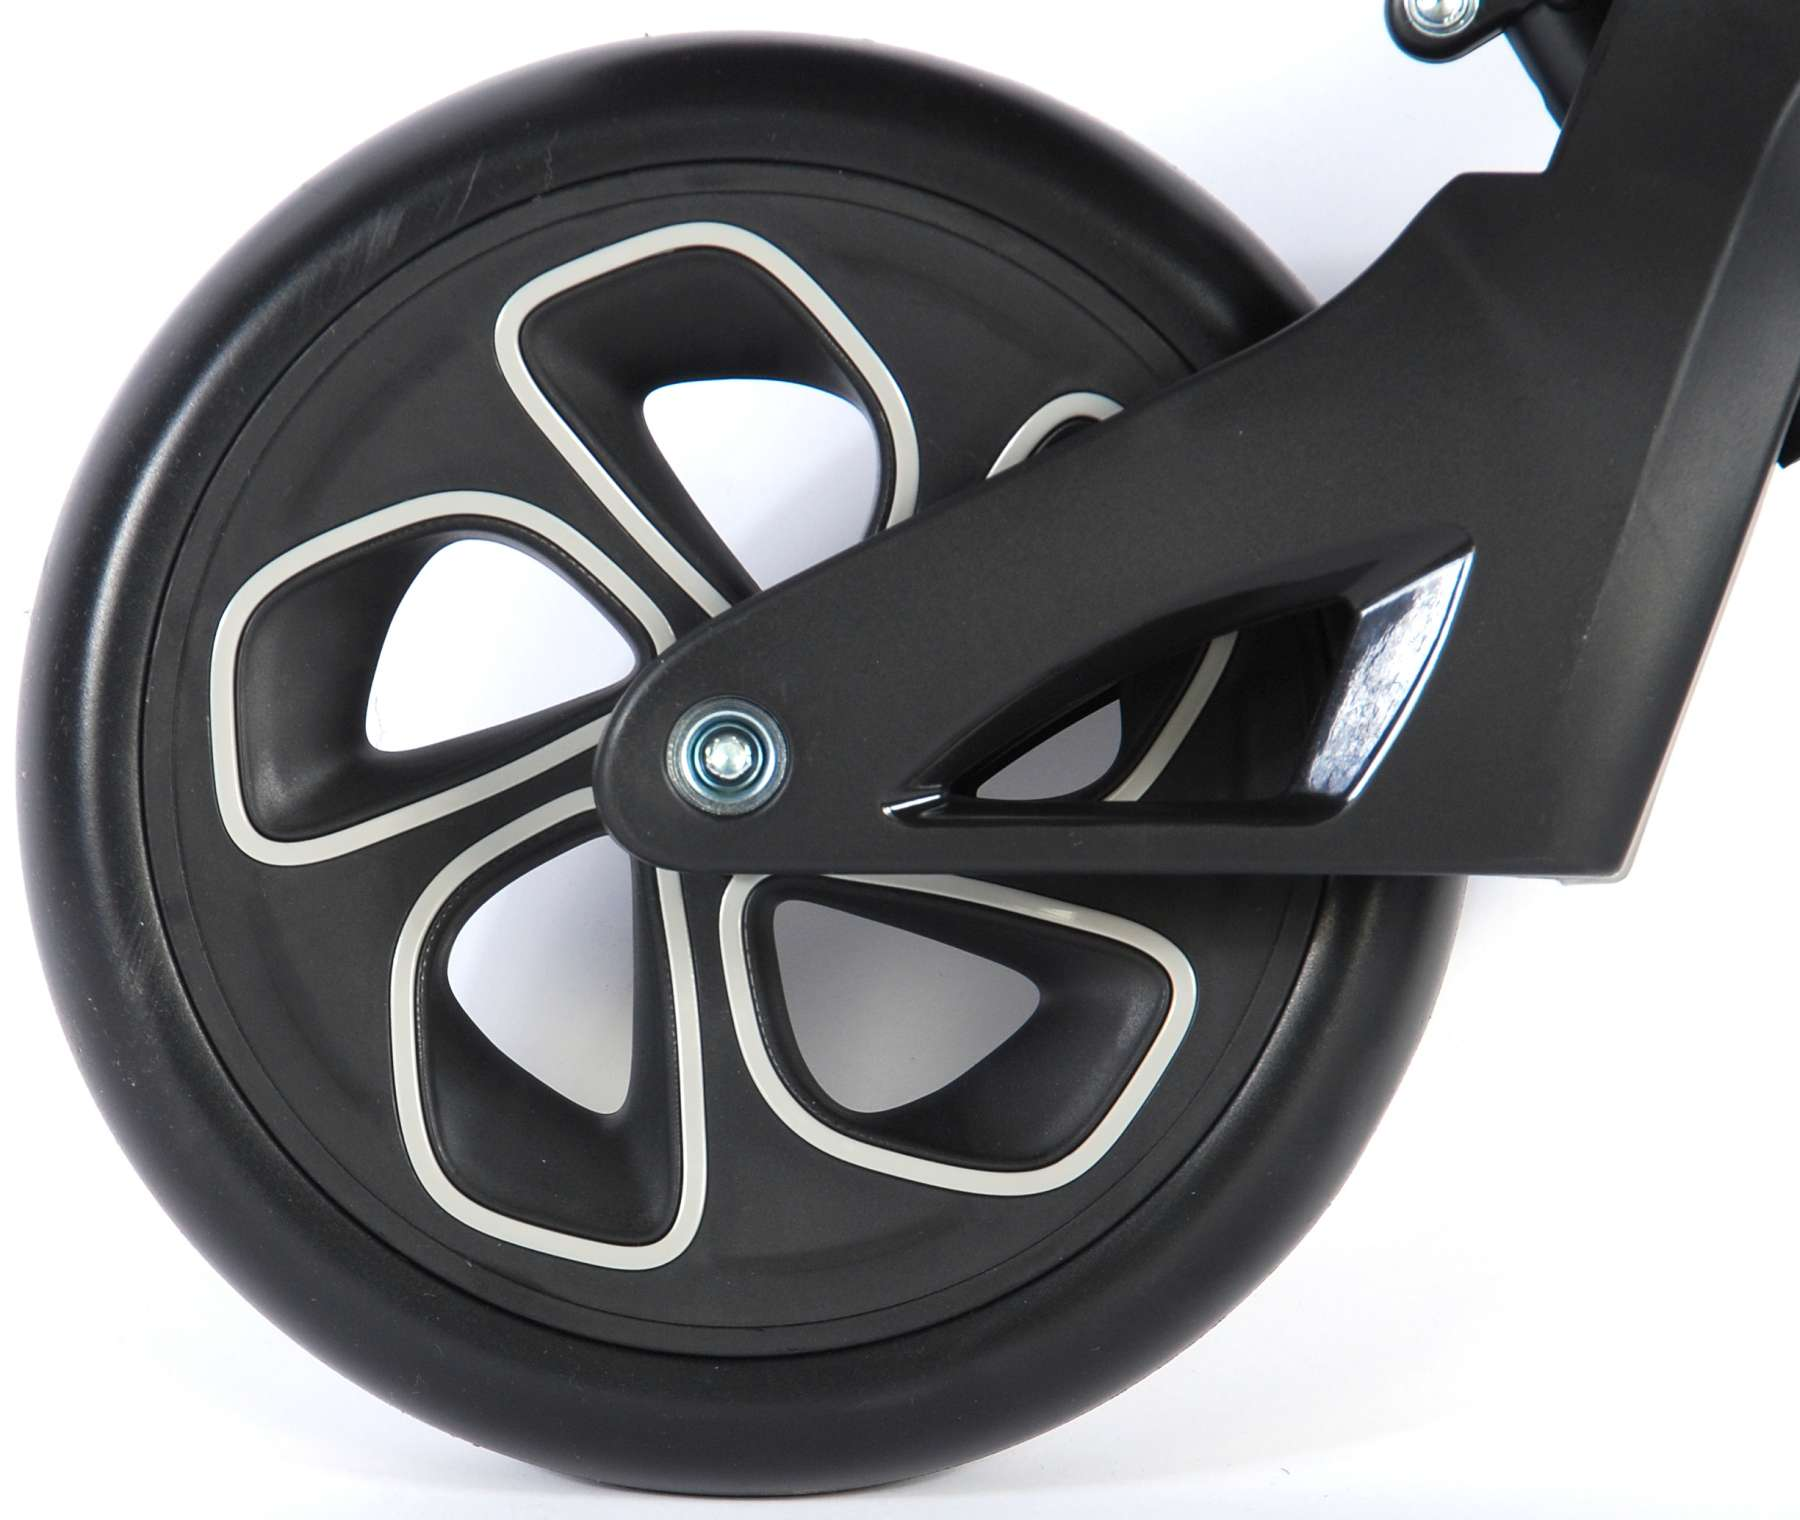 Bicicleta evolutiva QPlay Balance 10 pulgadas Roja - rueda trasera